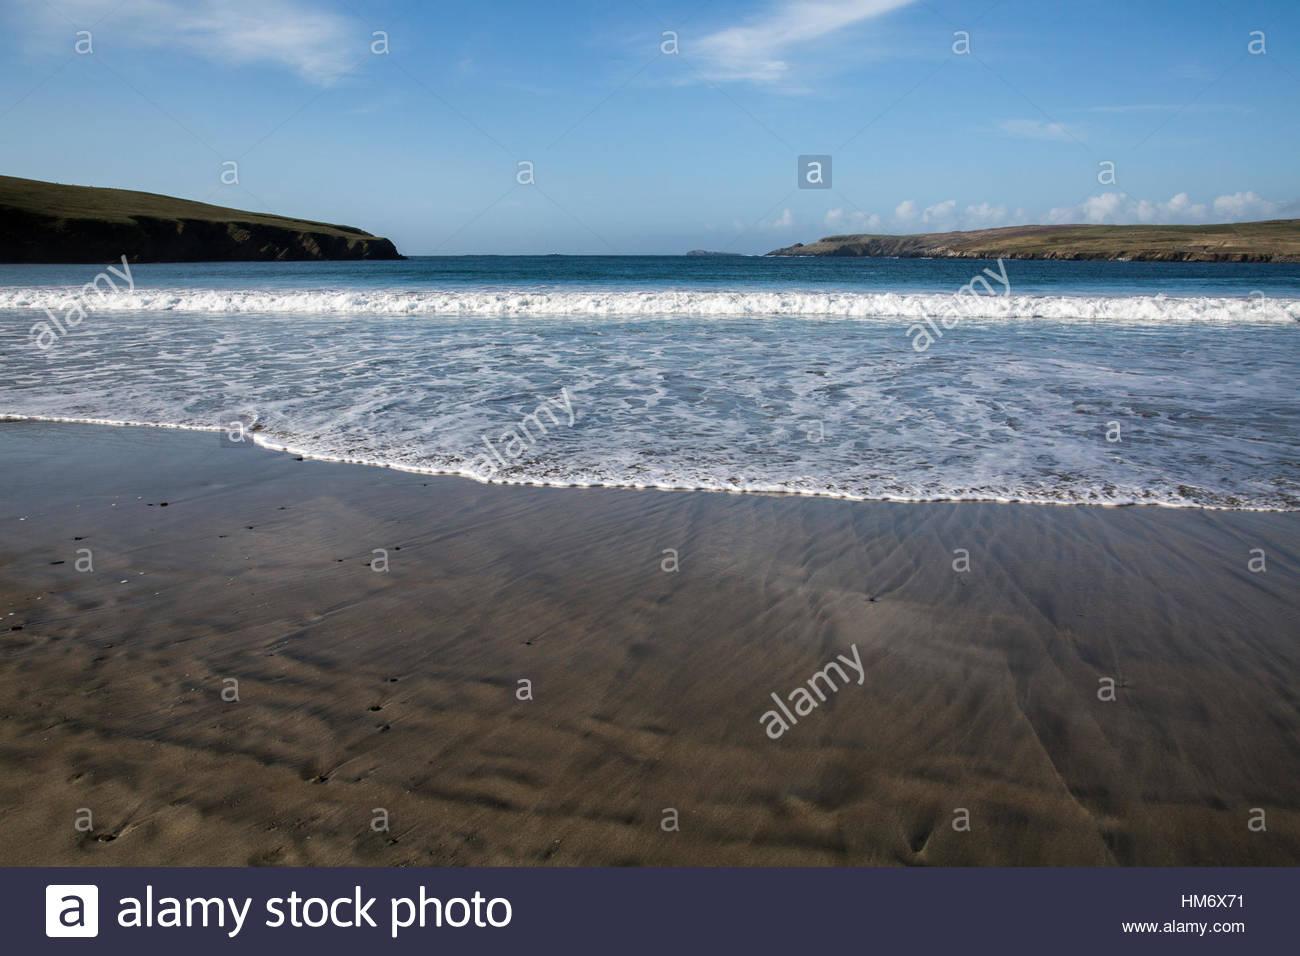 Sandsape and Beach of St. Ninia's Isle - Stock Image